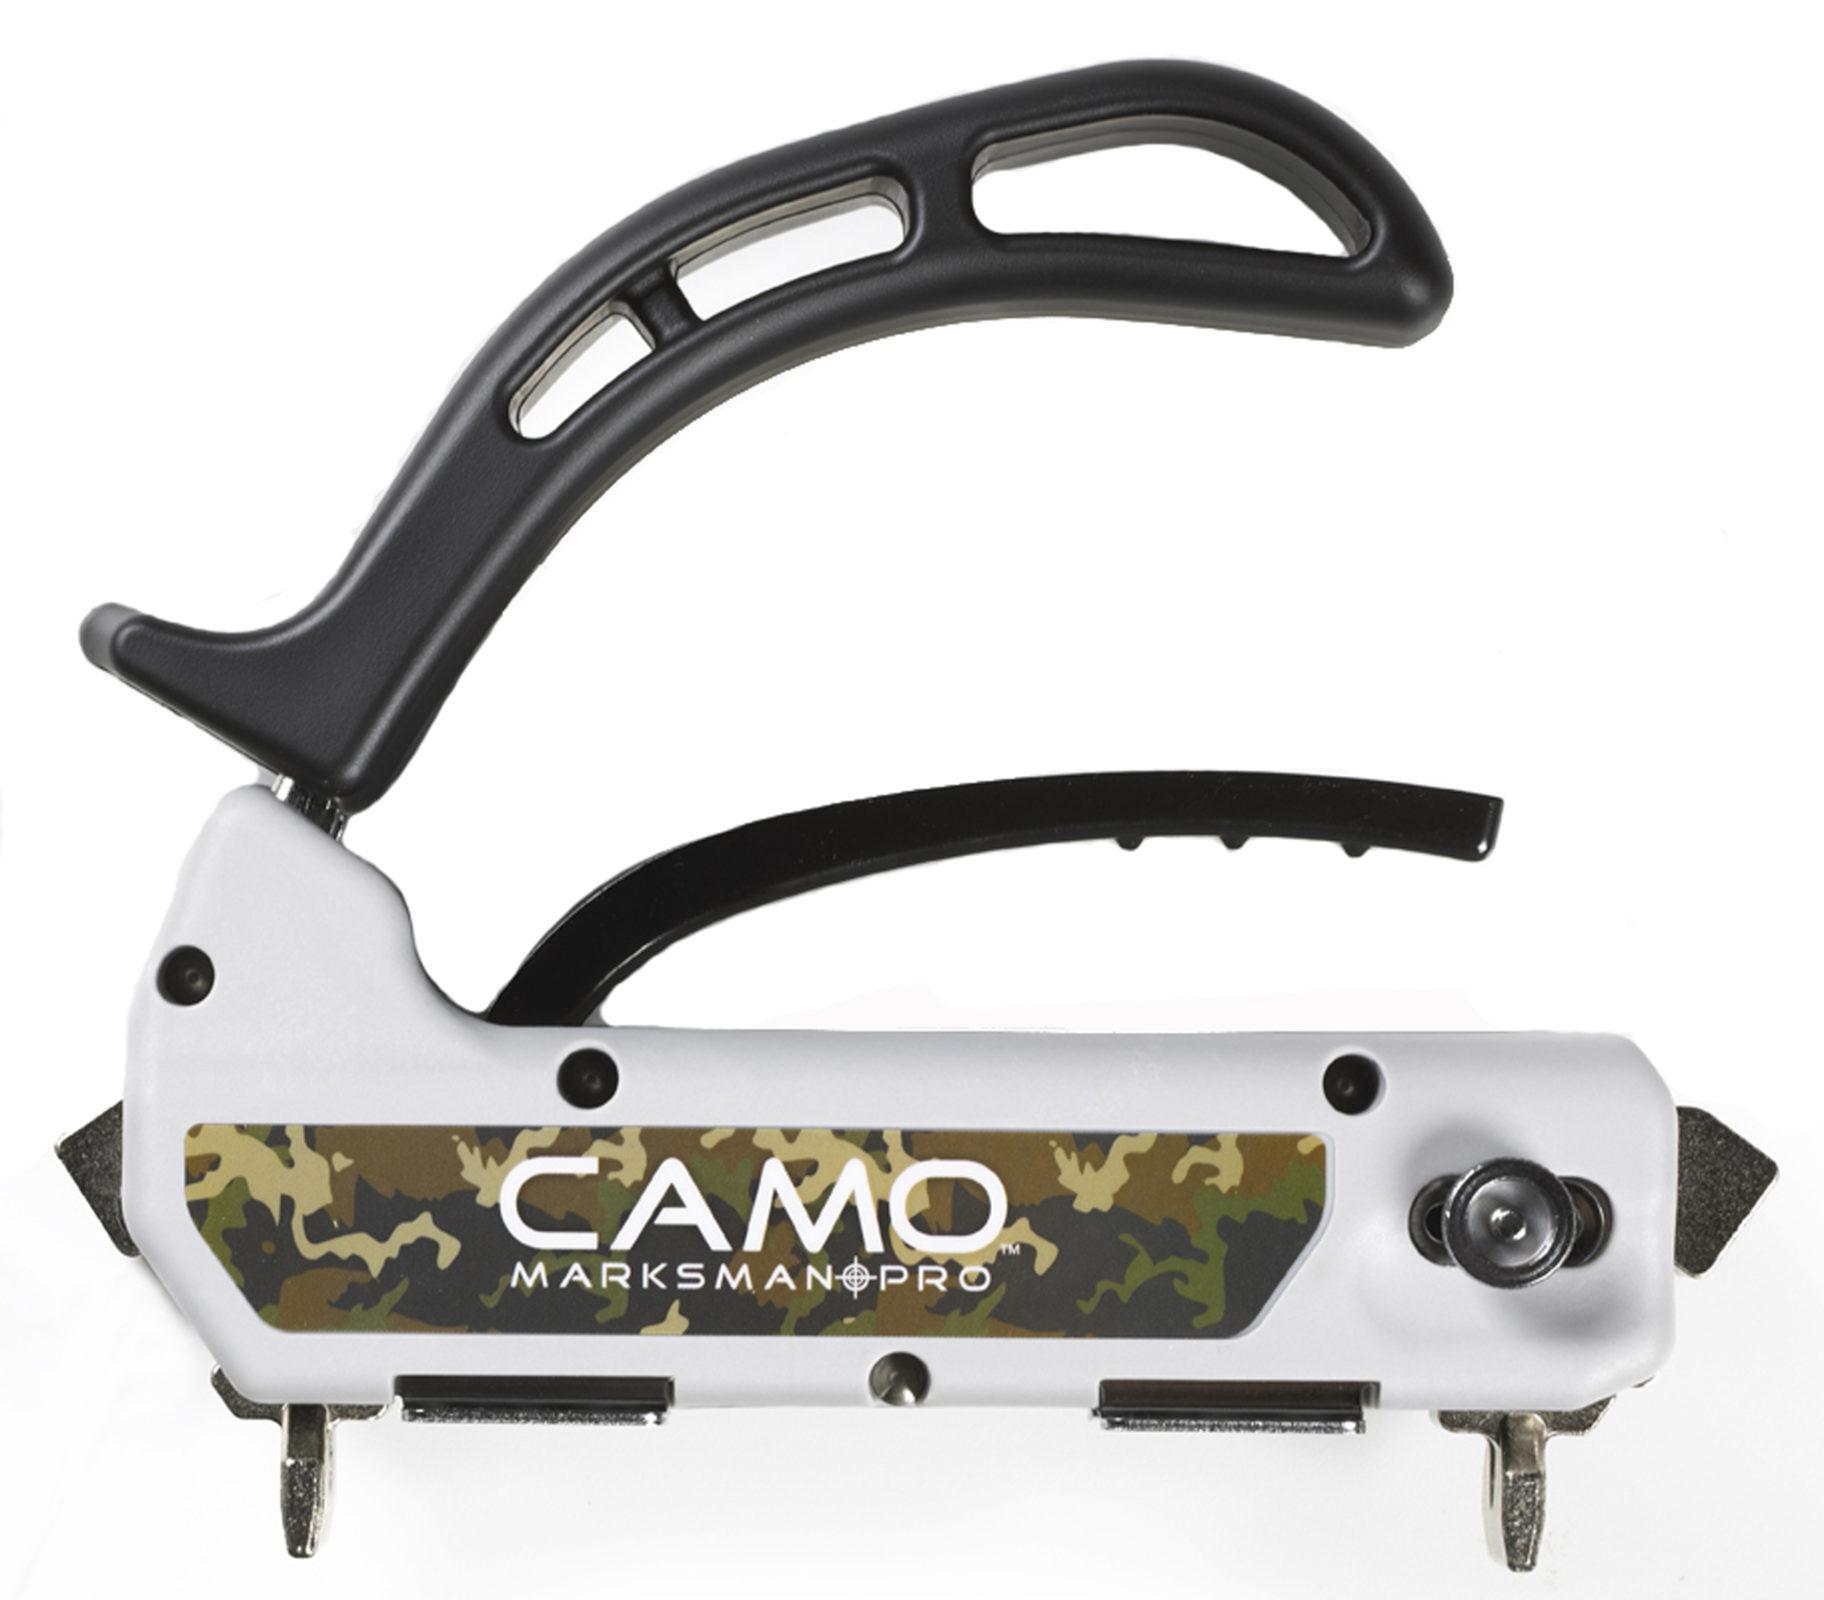 Camo Marksman Pro Tool Schillings